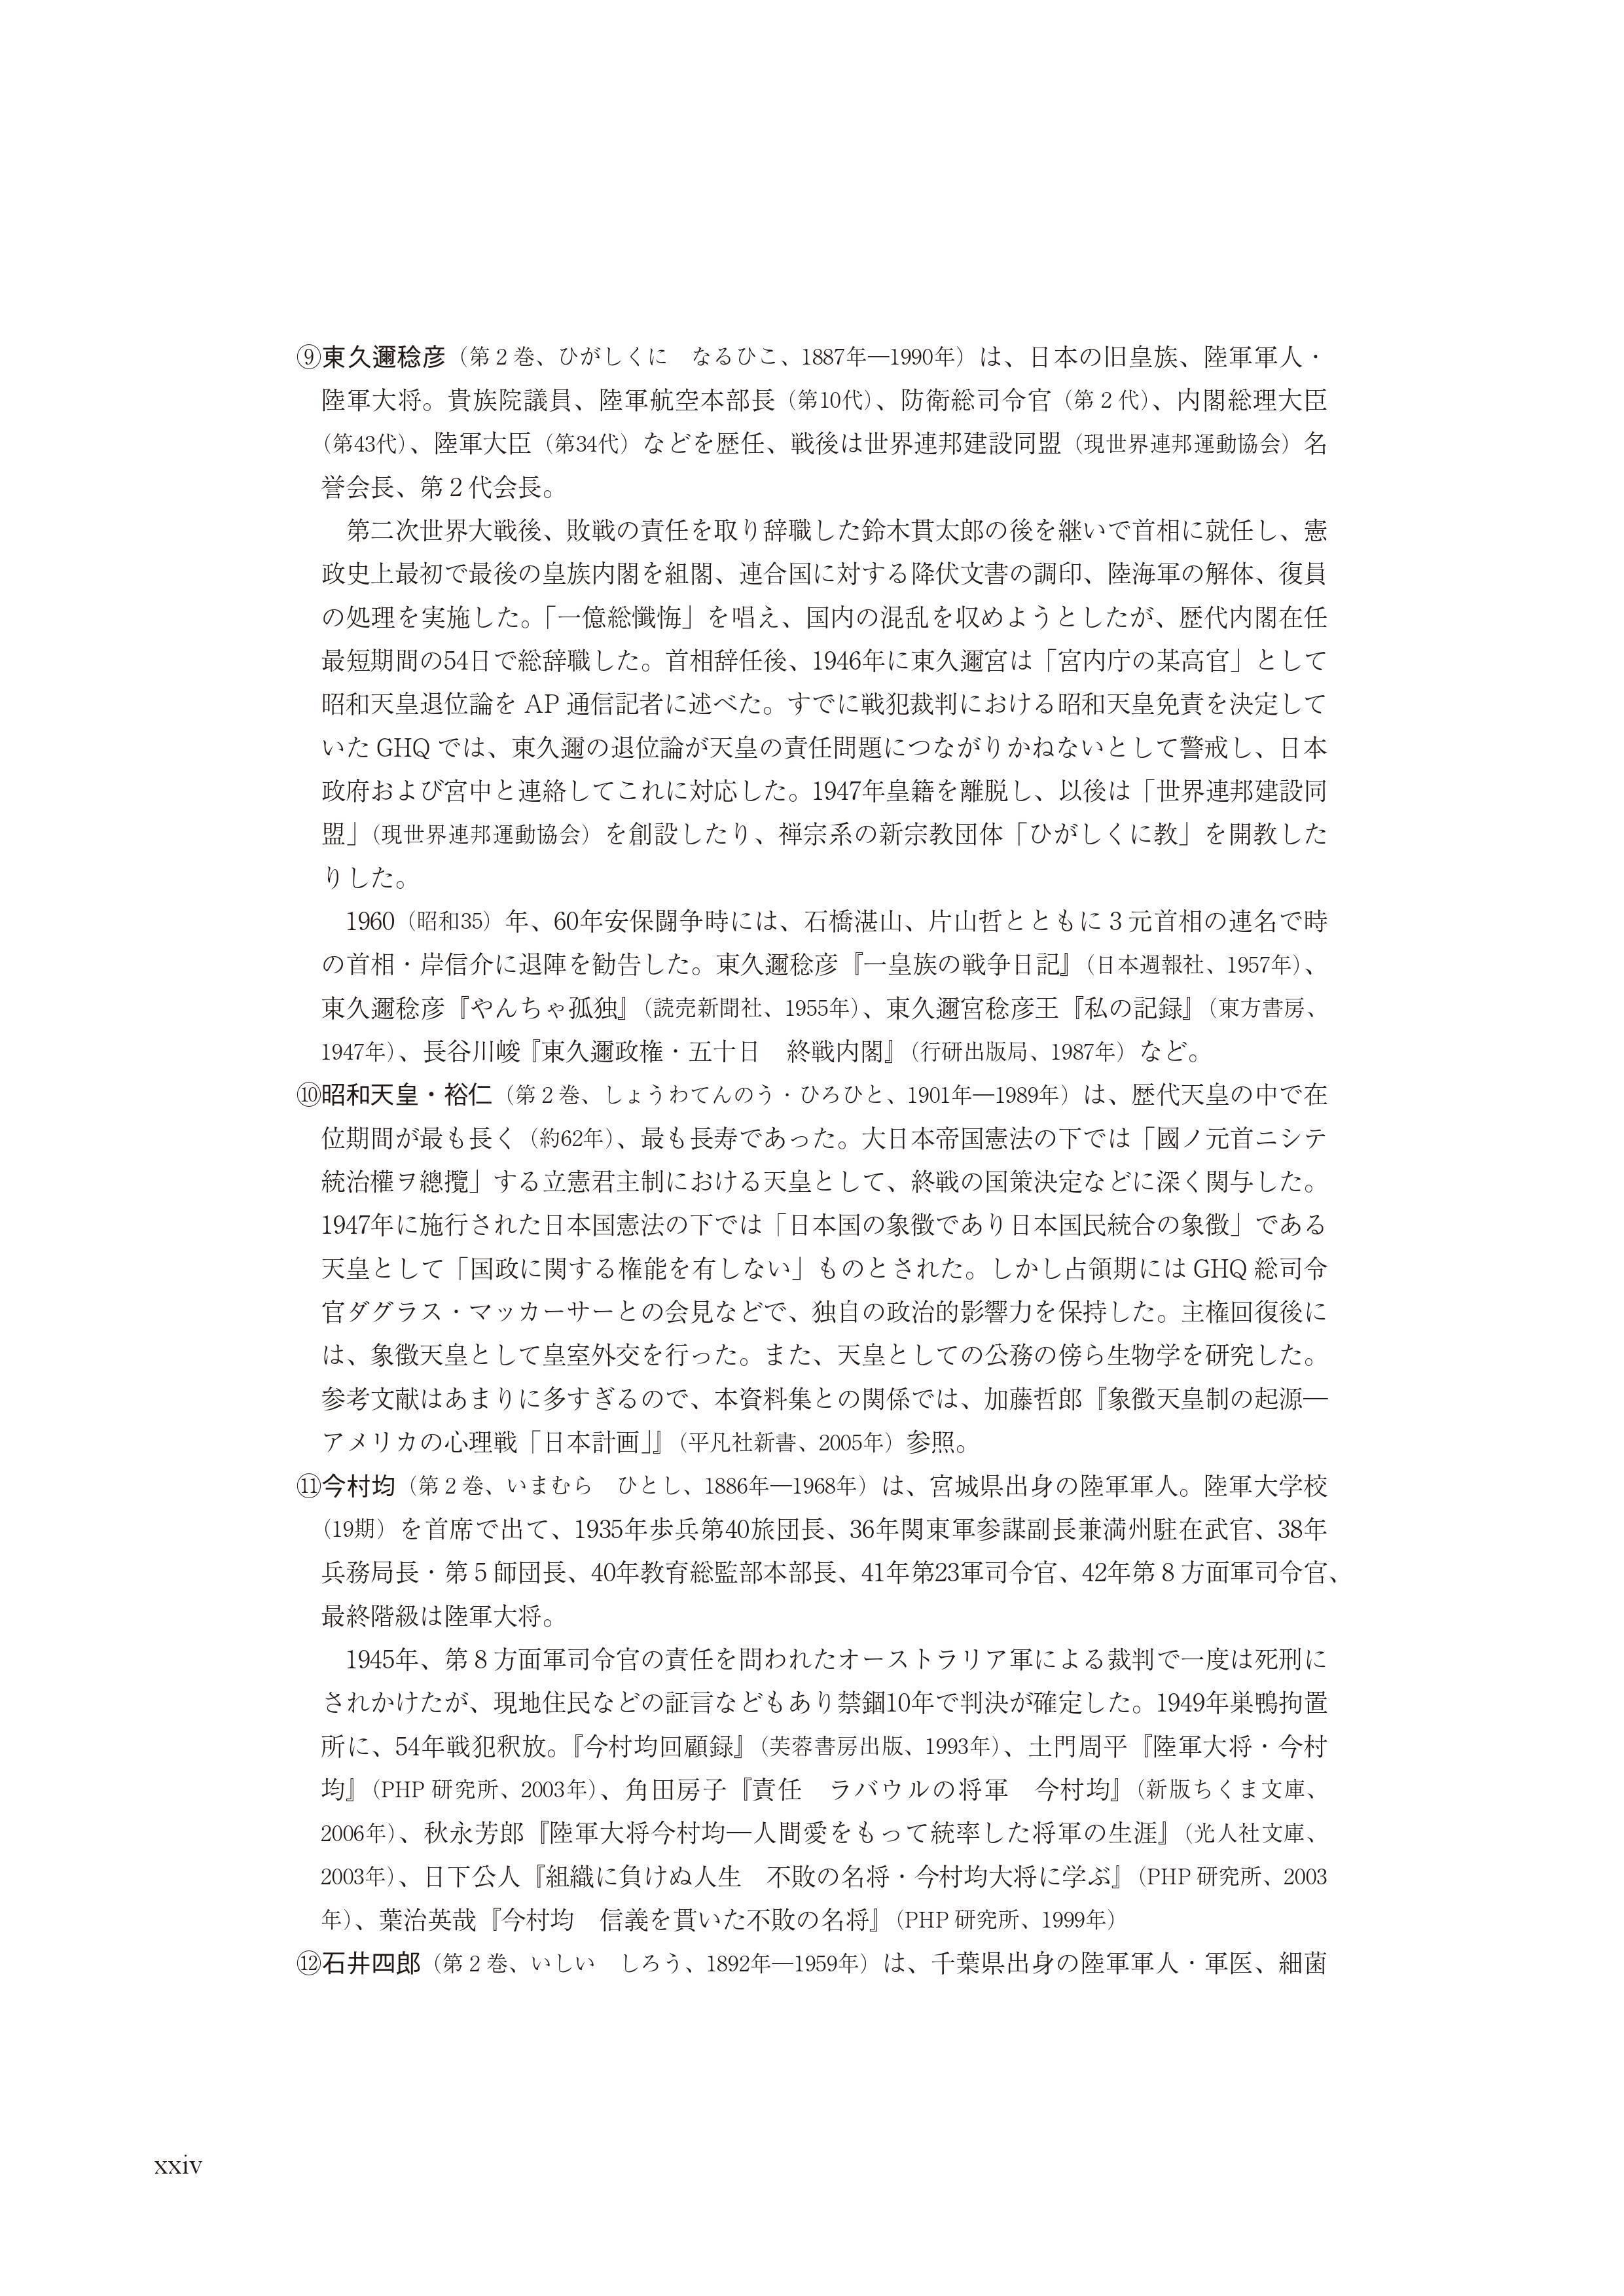 CIA日本人ファイル0001 (24)